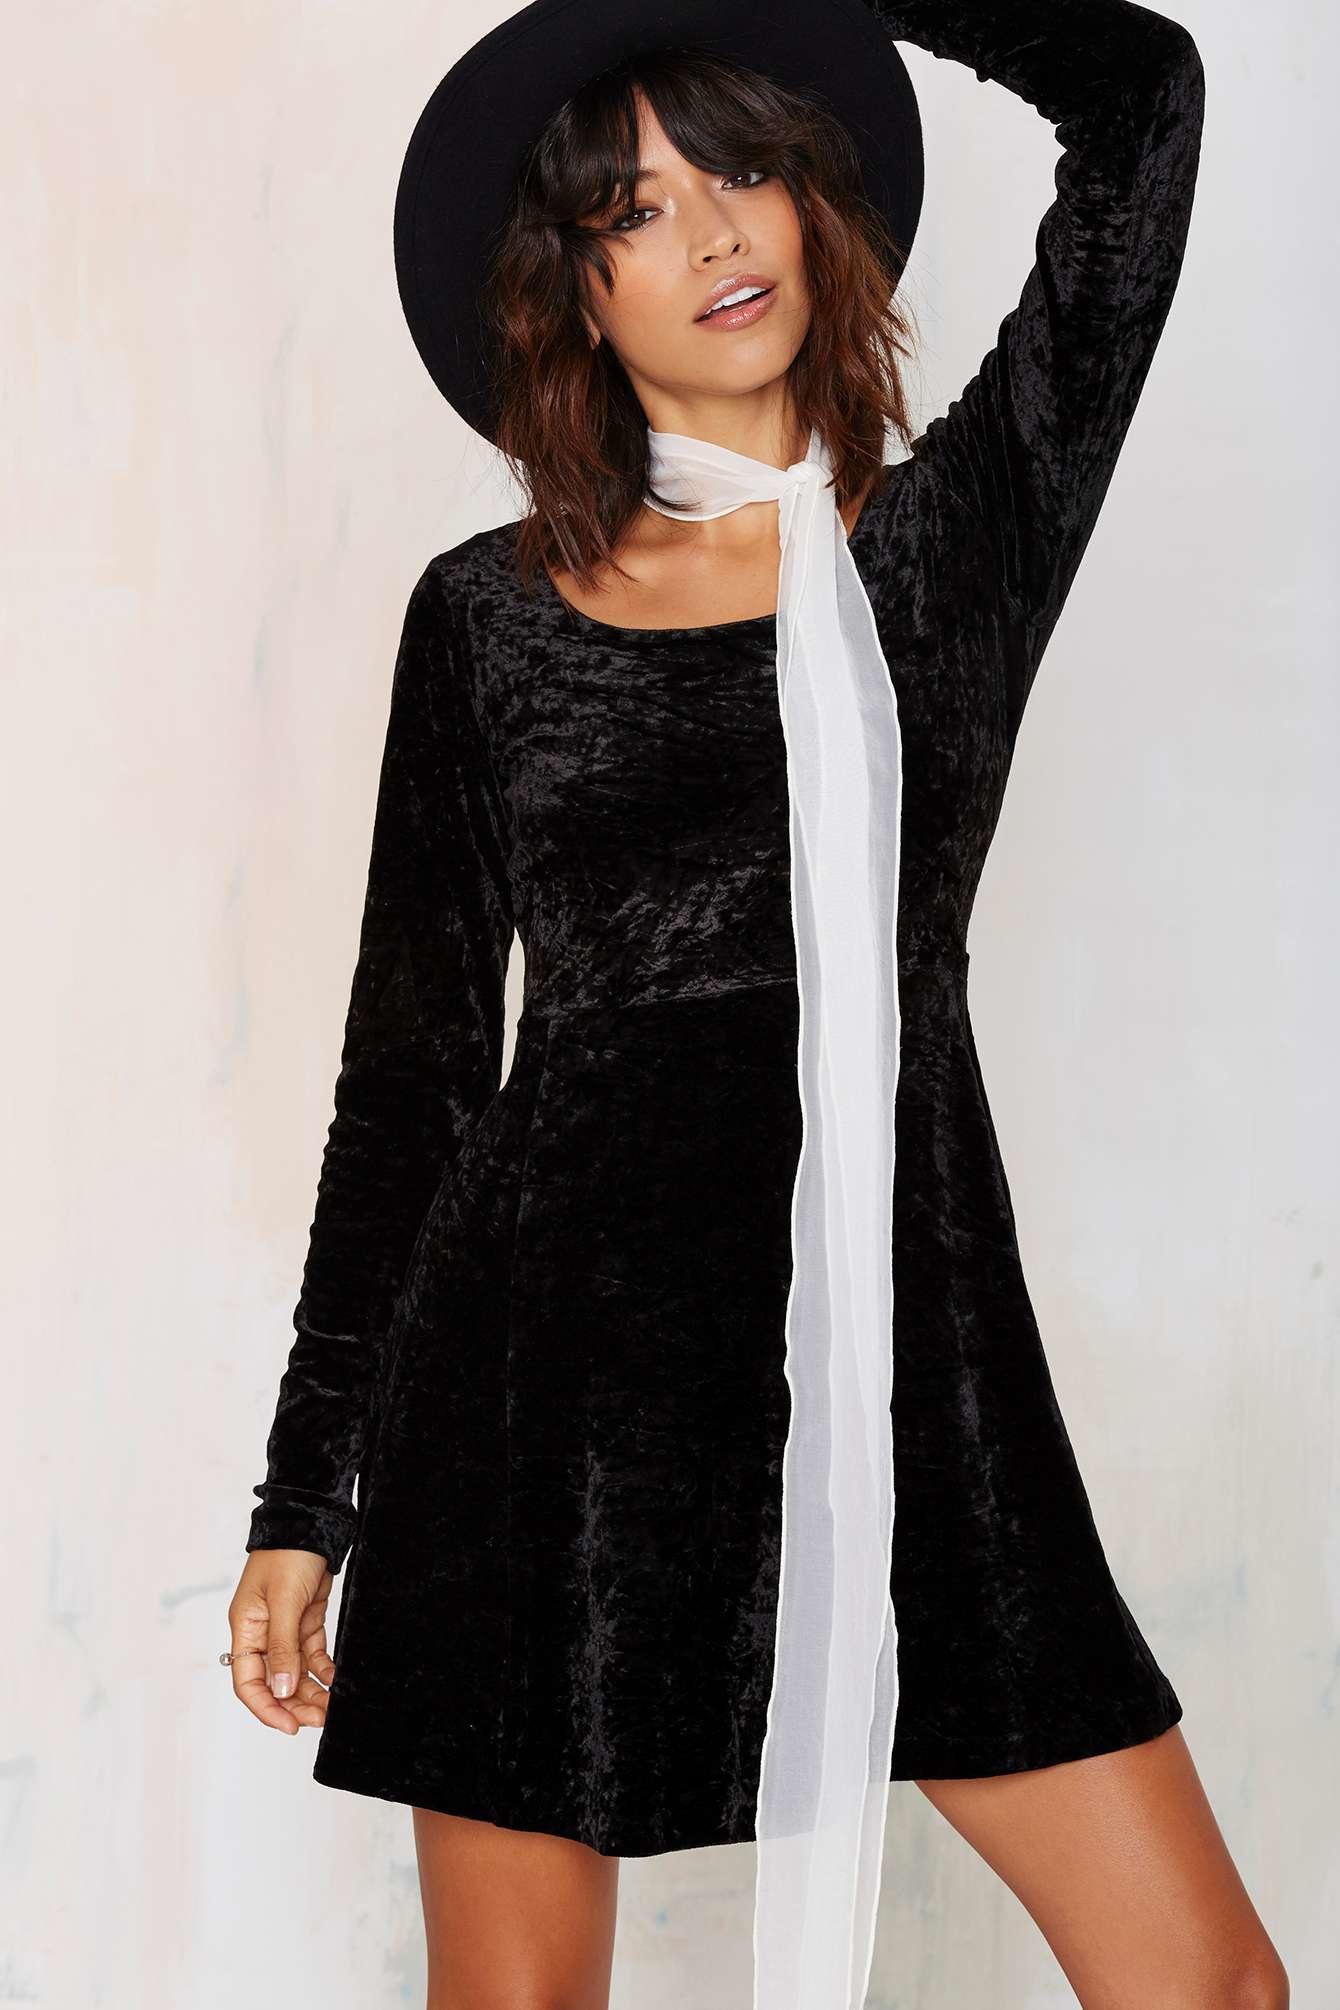 Nasty Gal Betsey Johnson Save Tonight Velvet Dress In